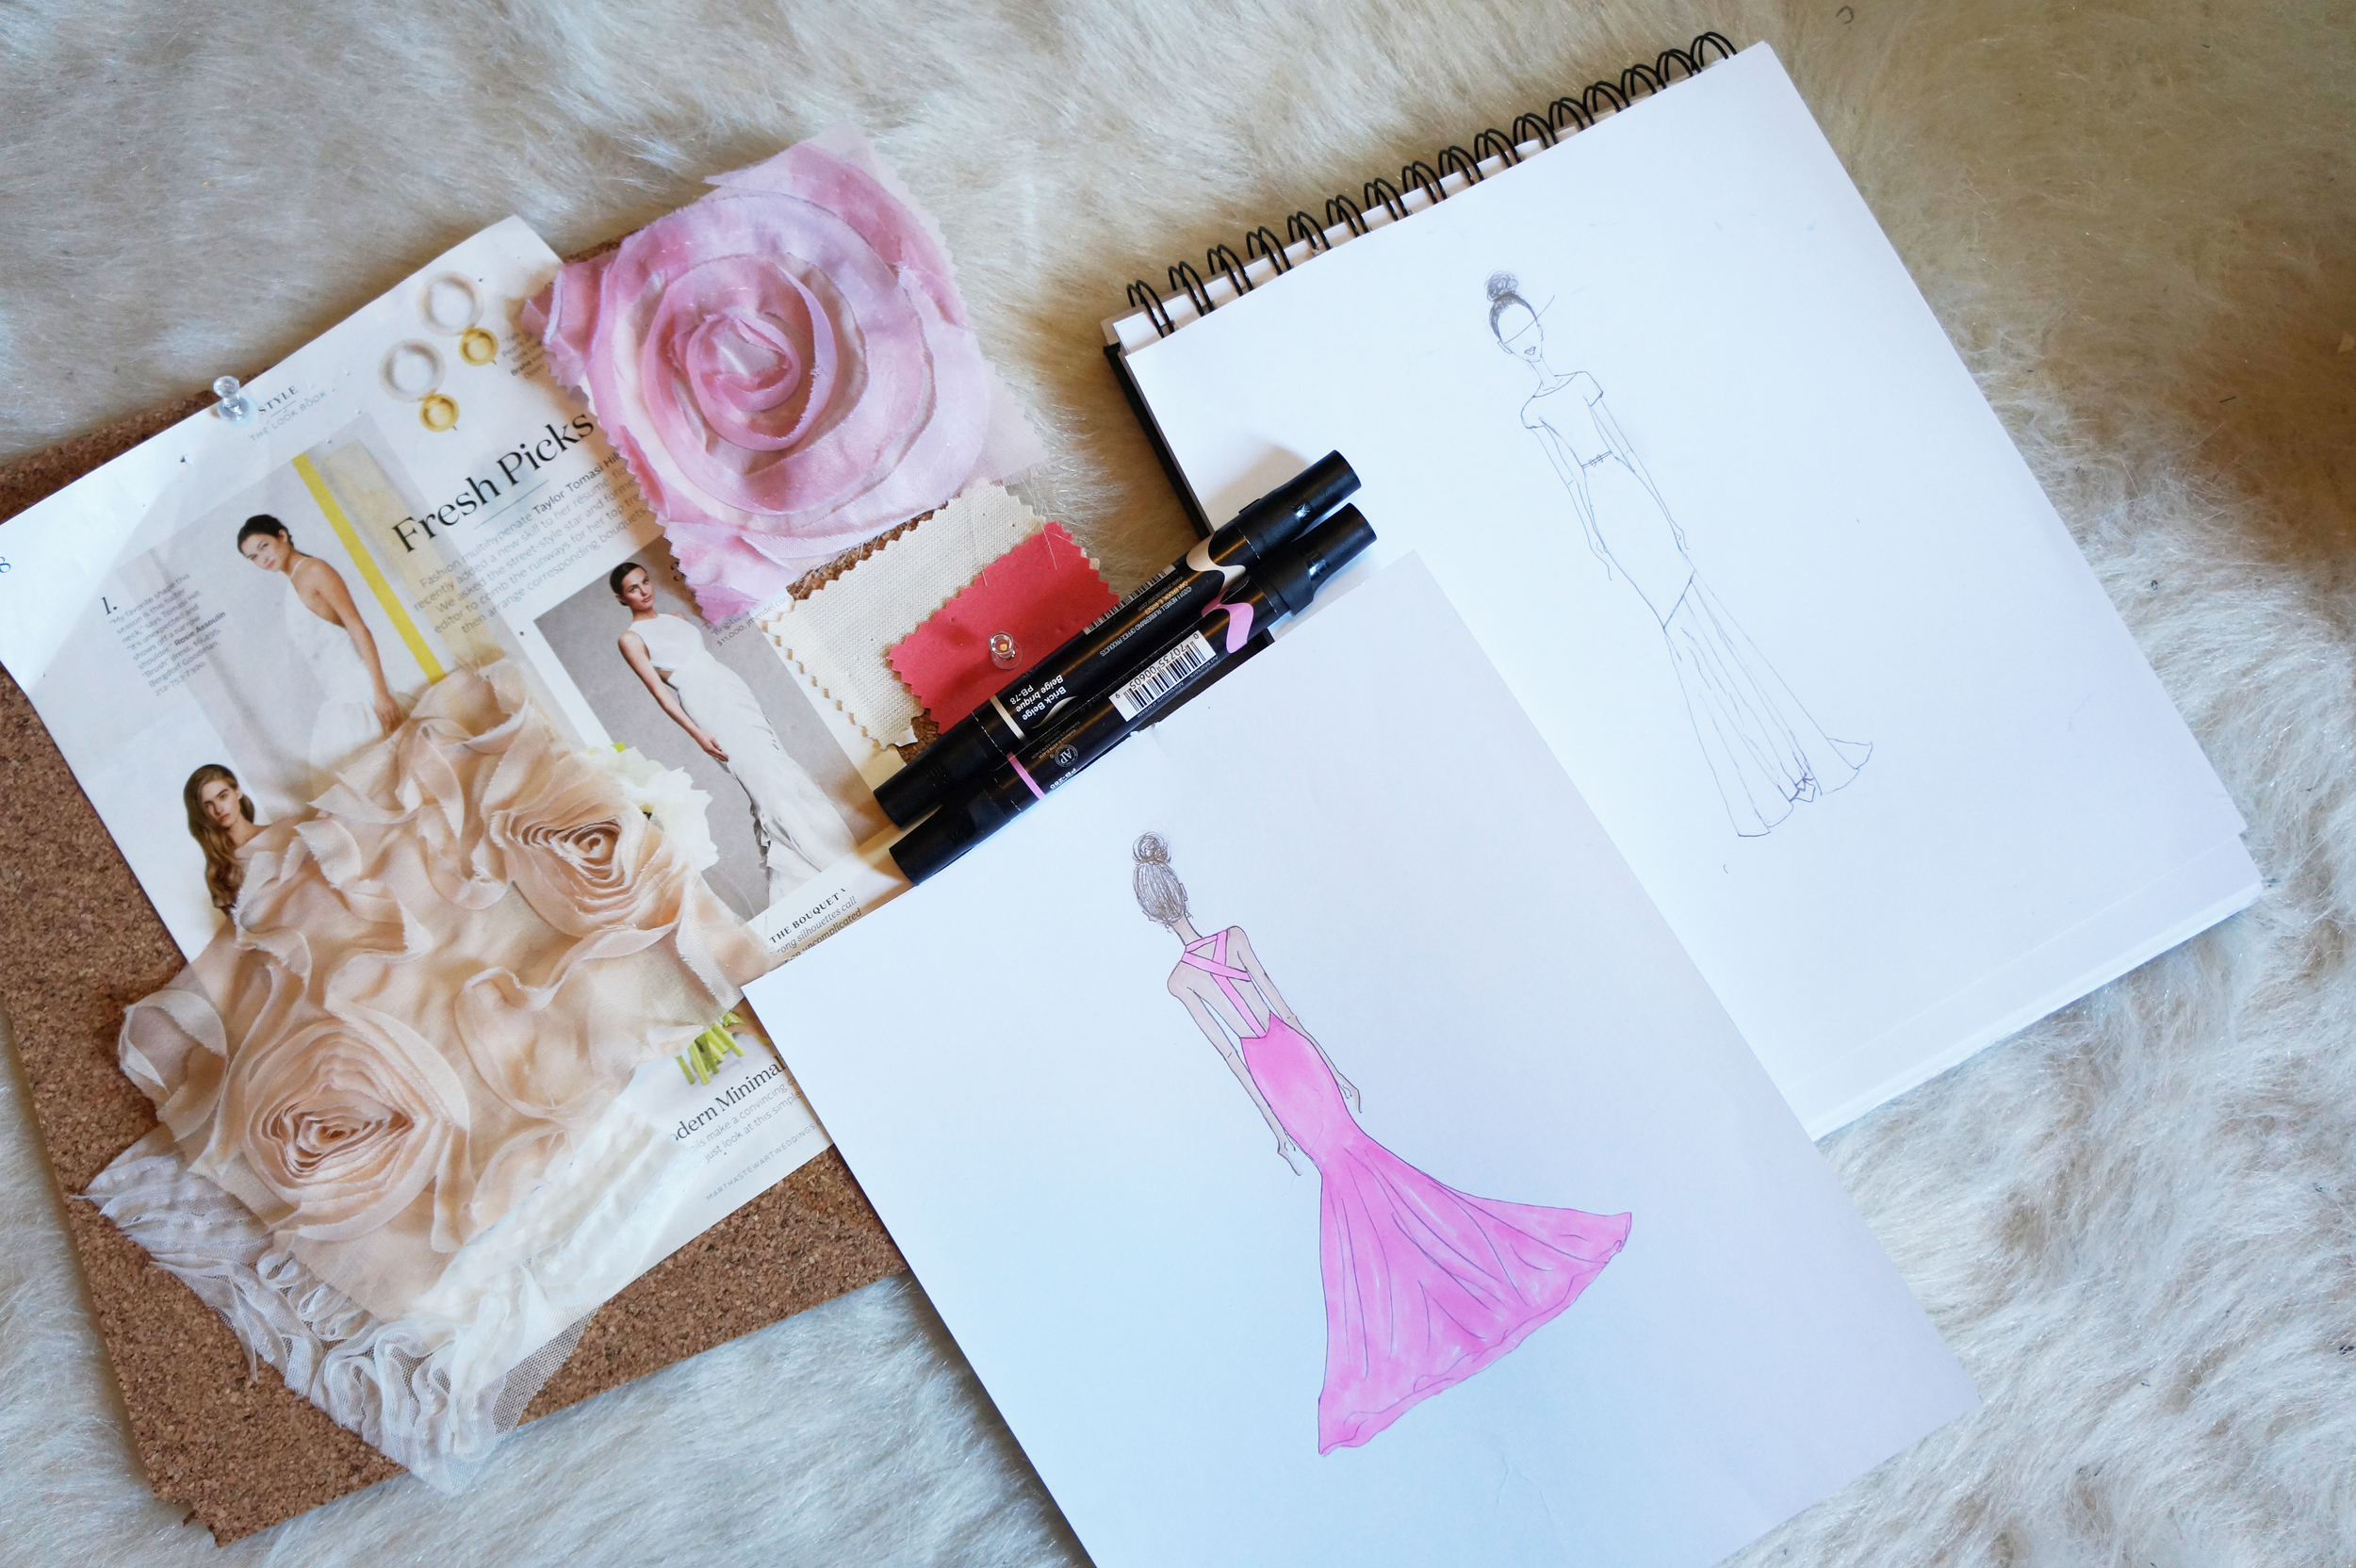 Andrea-Fenise-Concrete-Rose-Fashion-Illustration